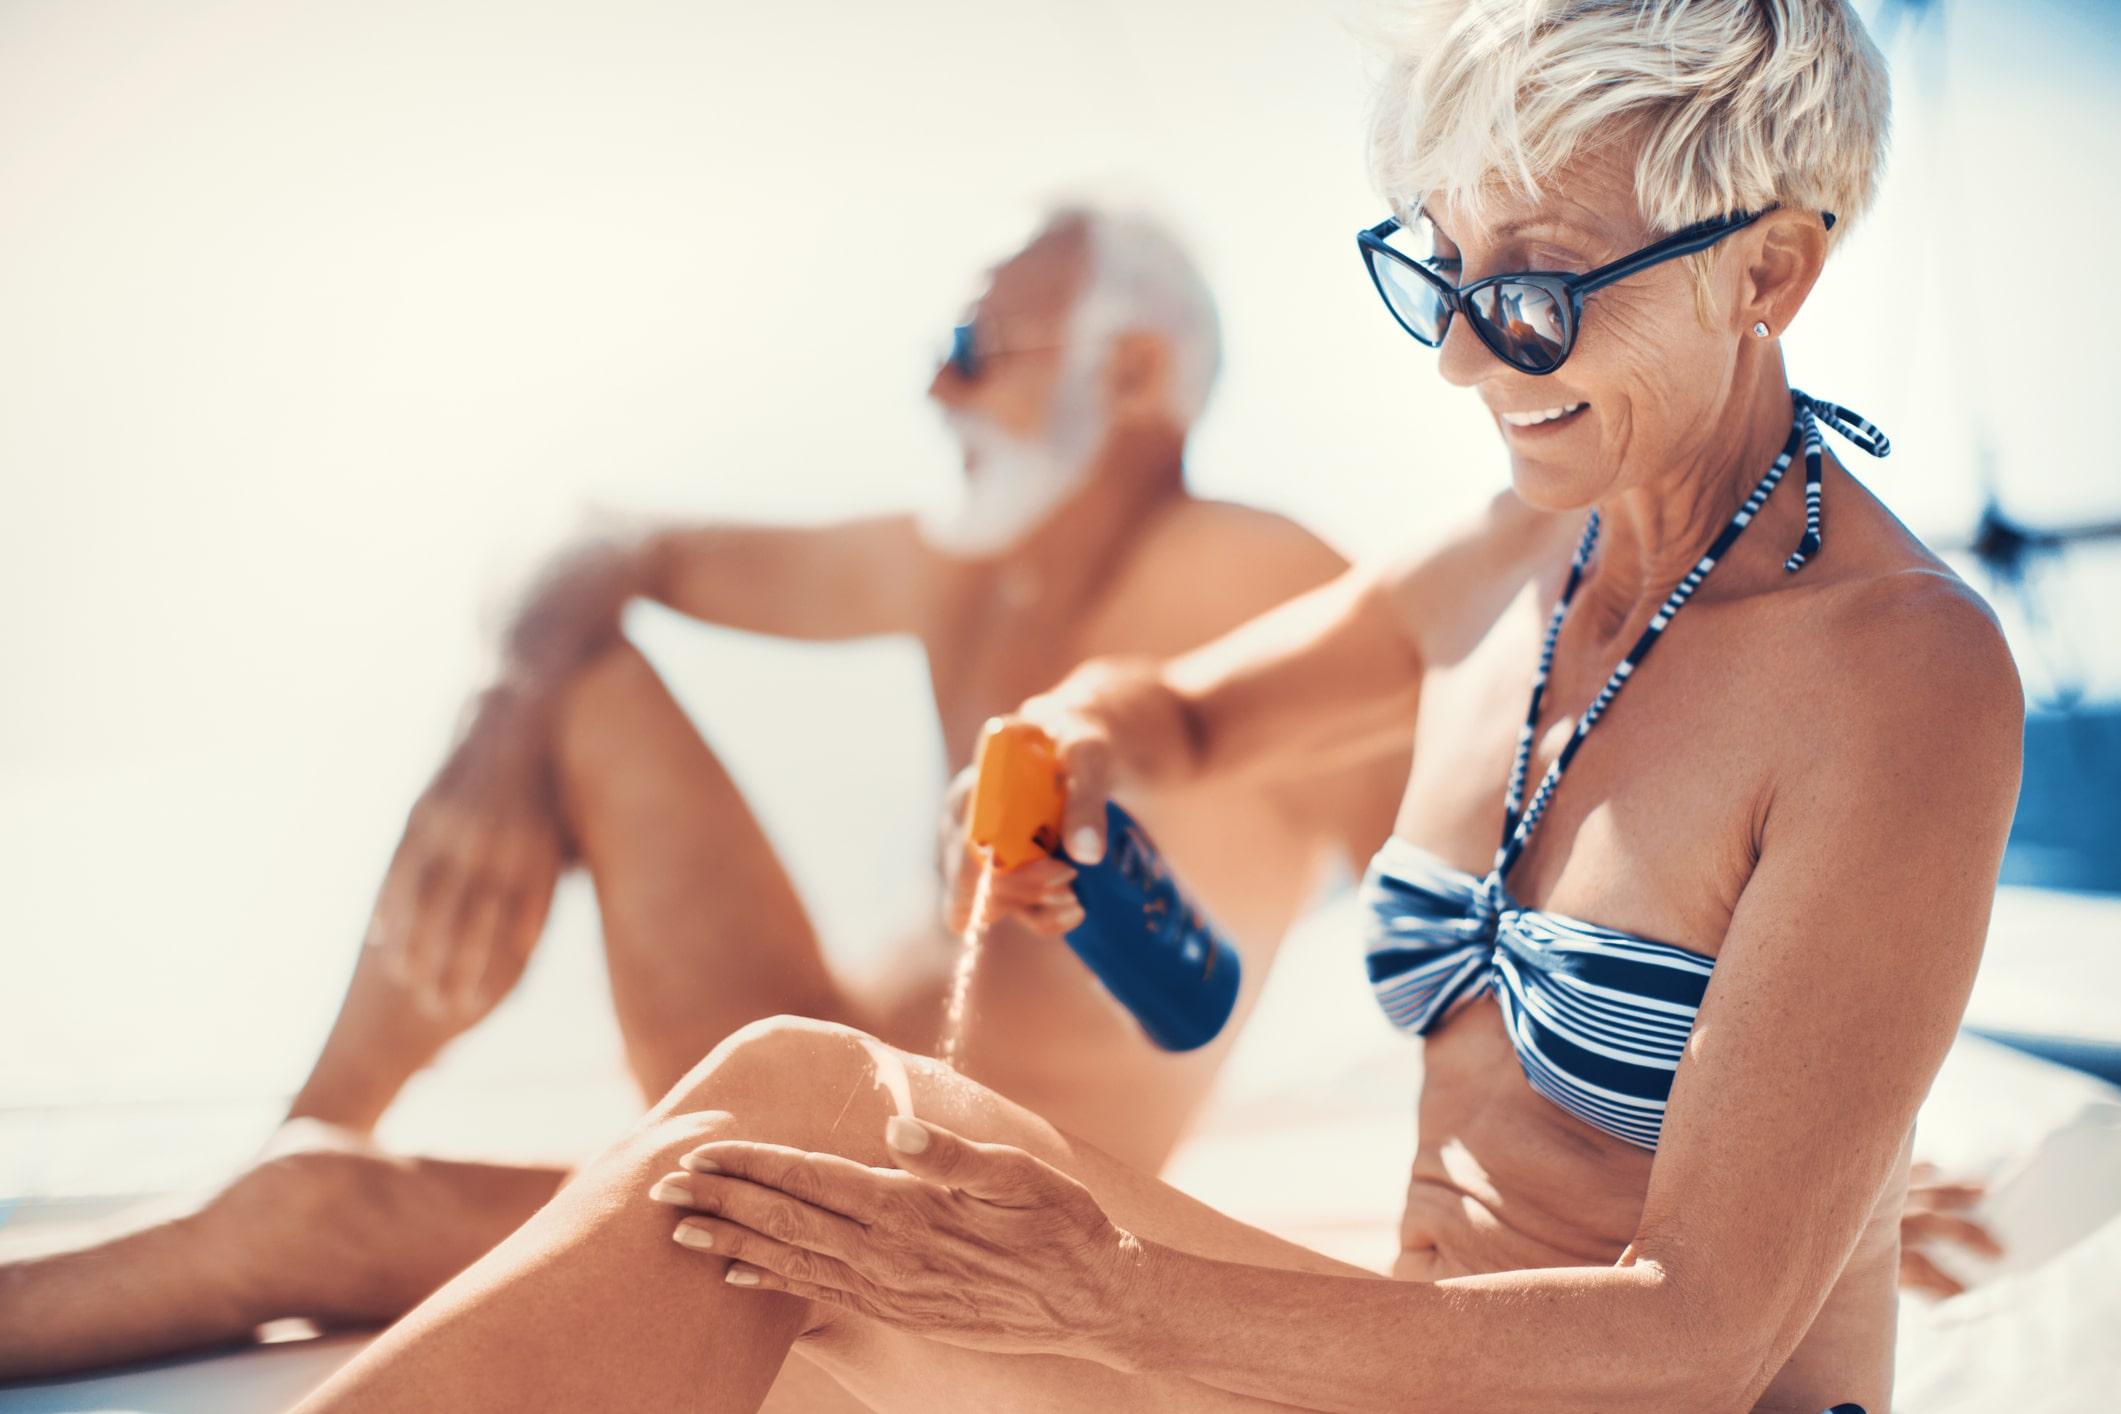 manchas sol playa crema